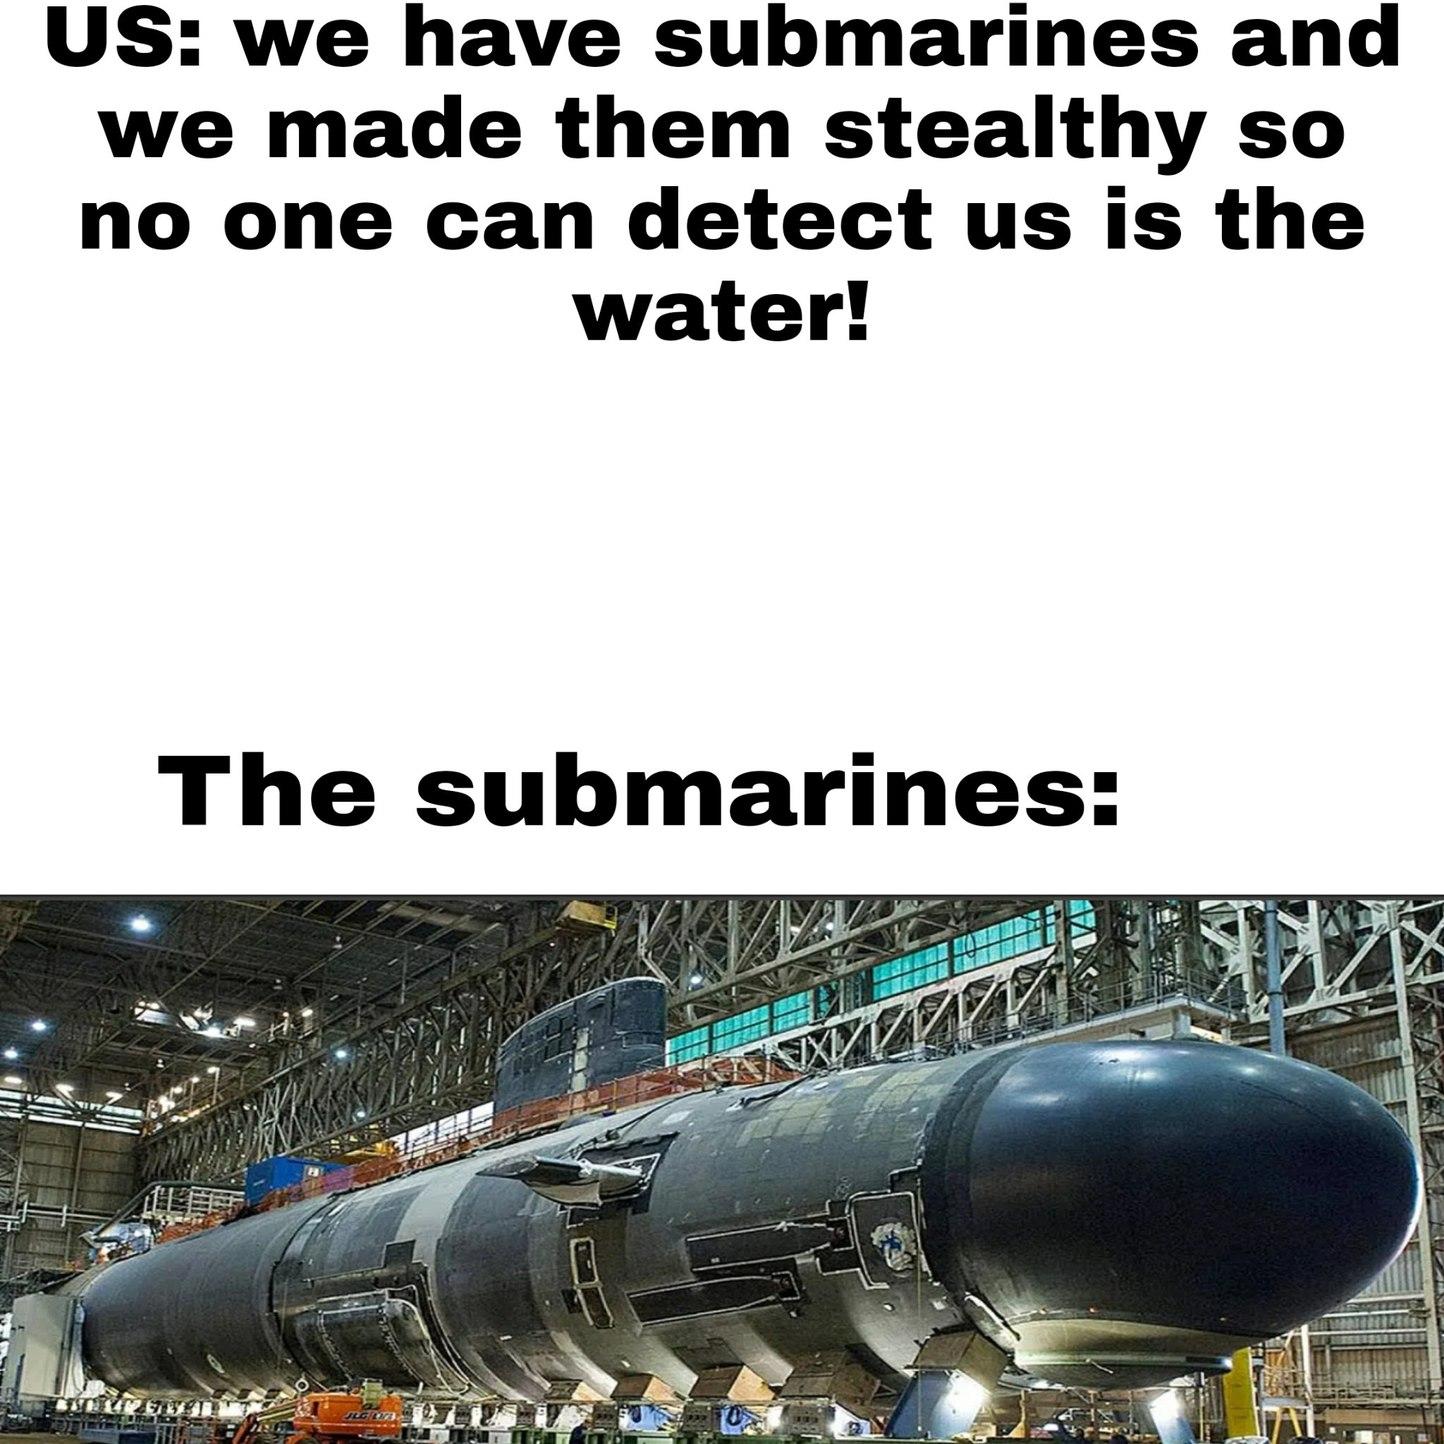 Original meme